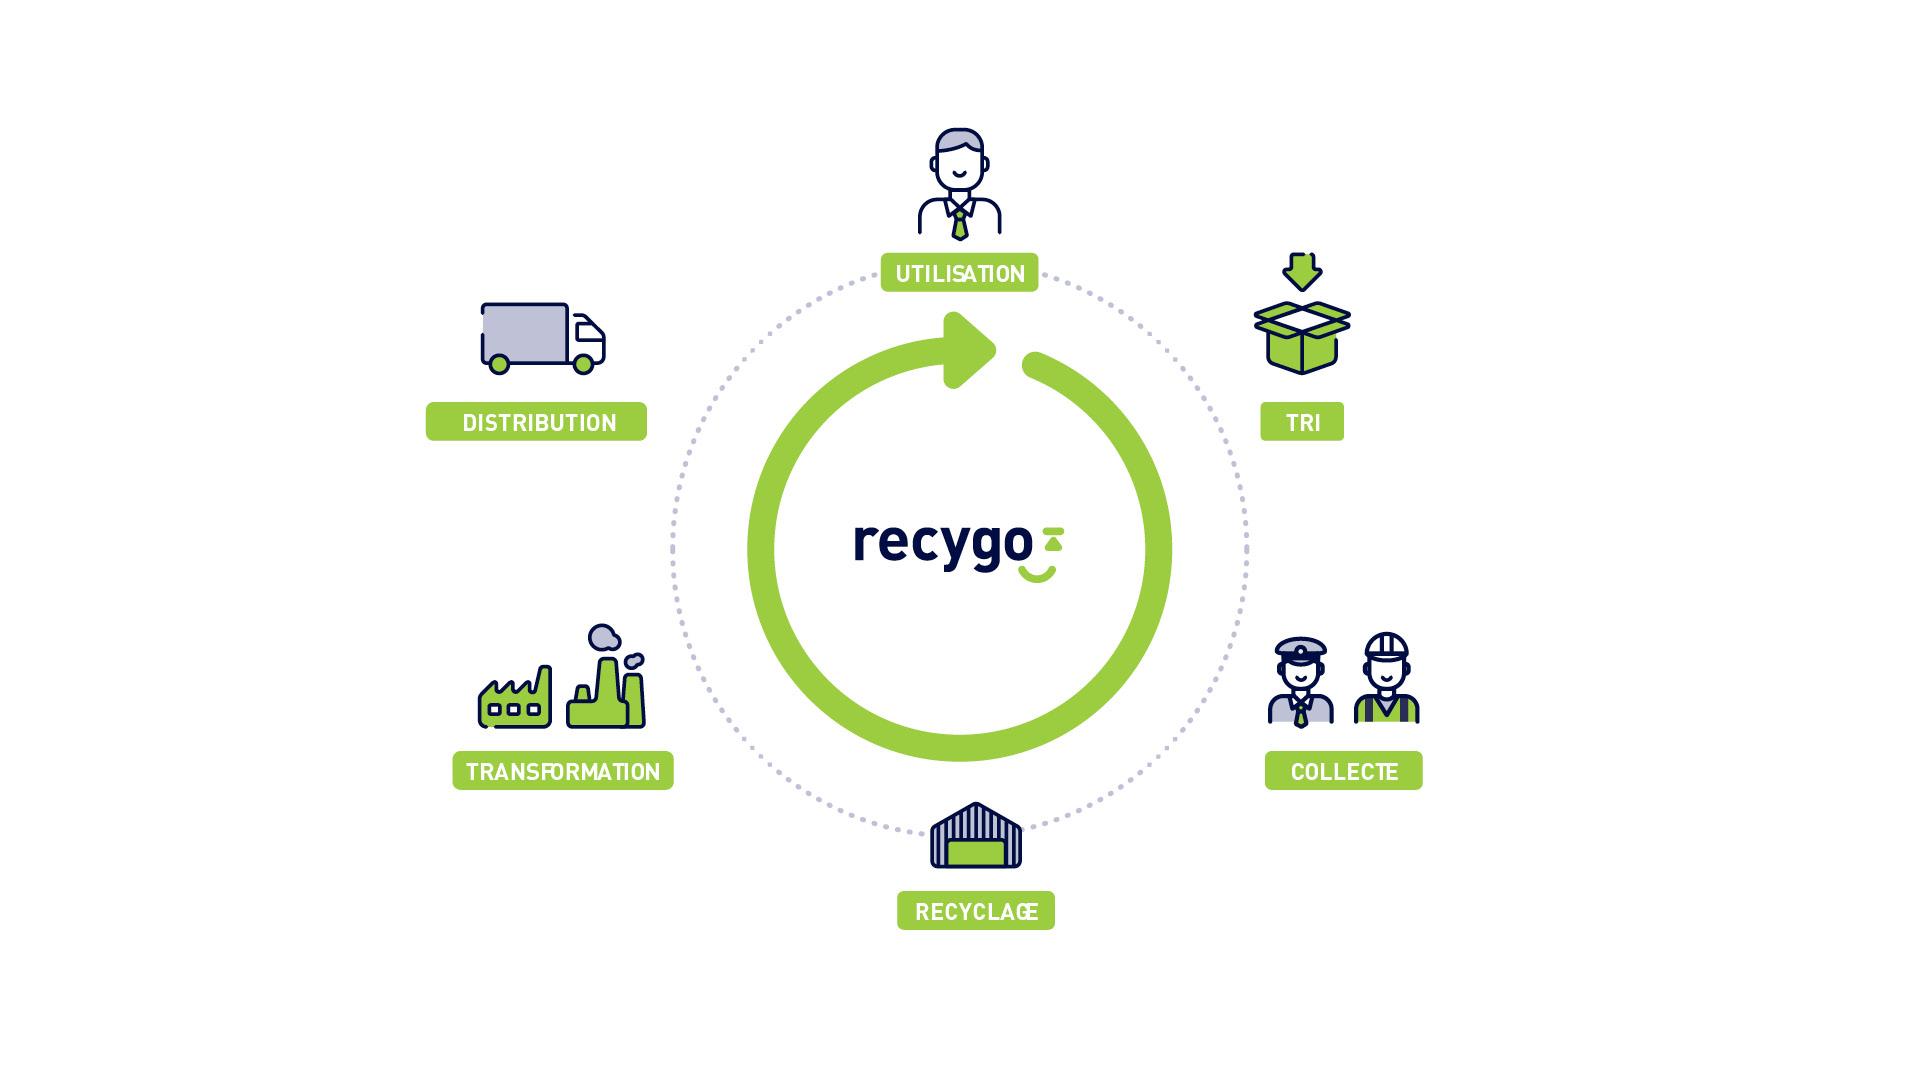 recygo_casclient_12